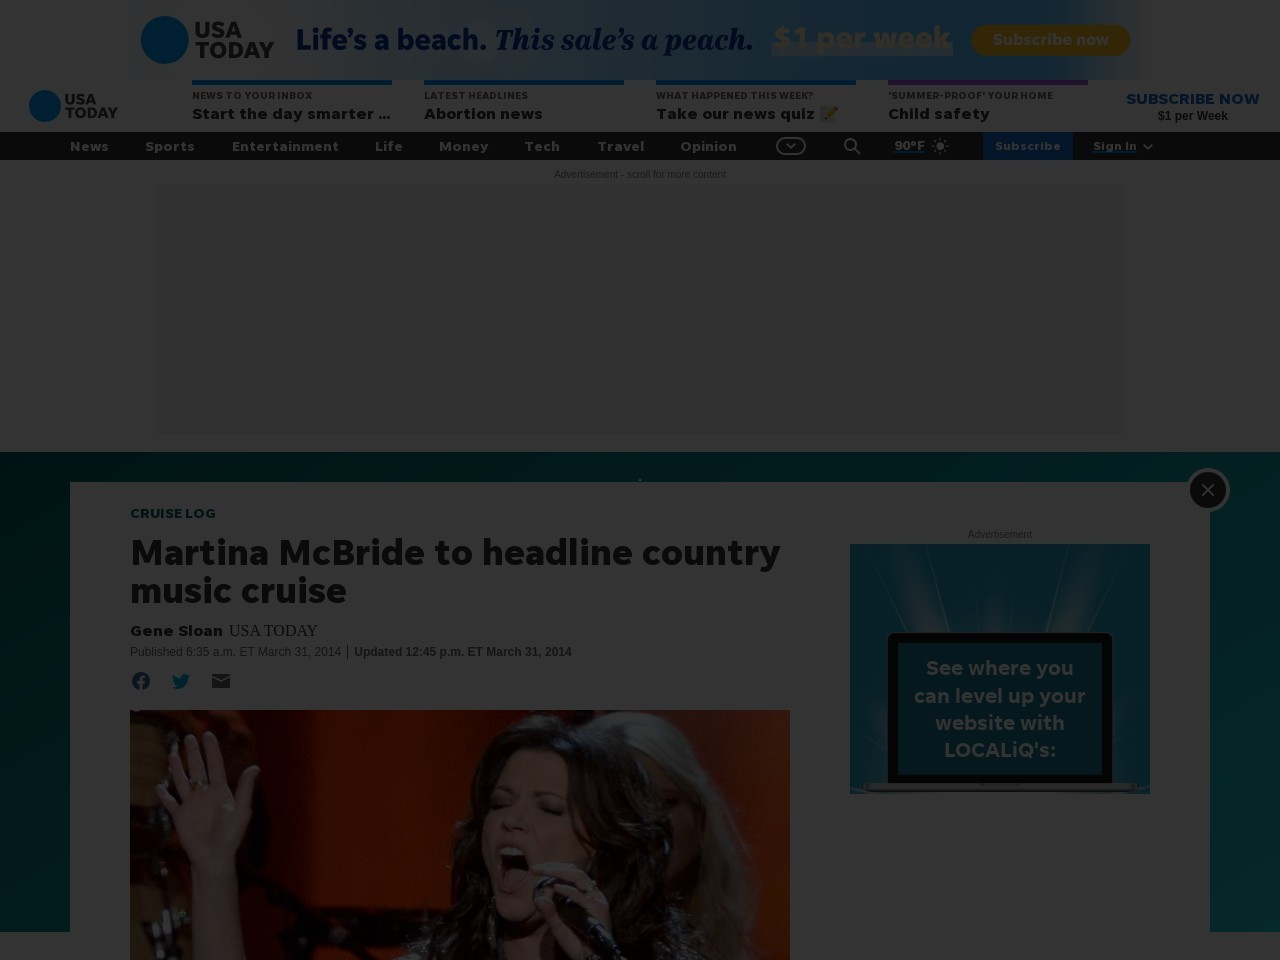 Martina McBride to headline country music cruise